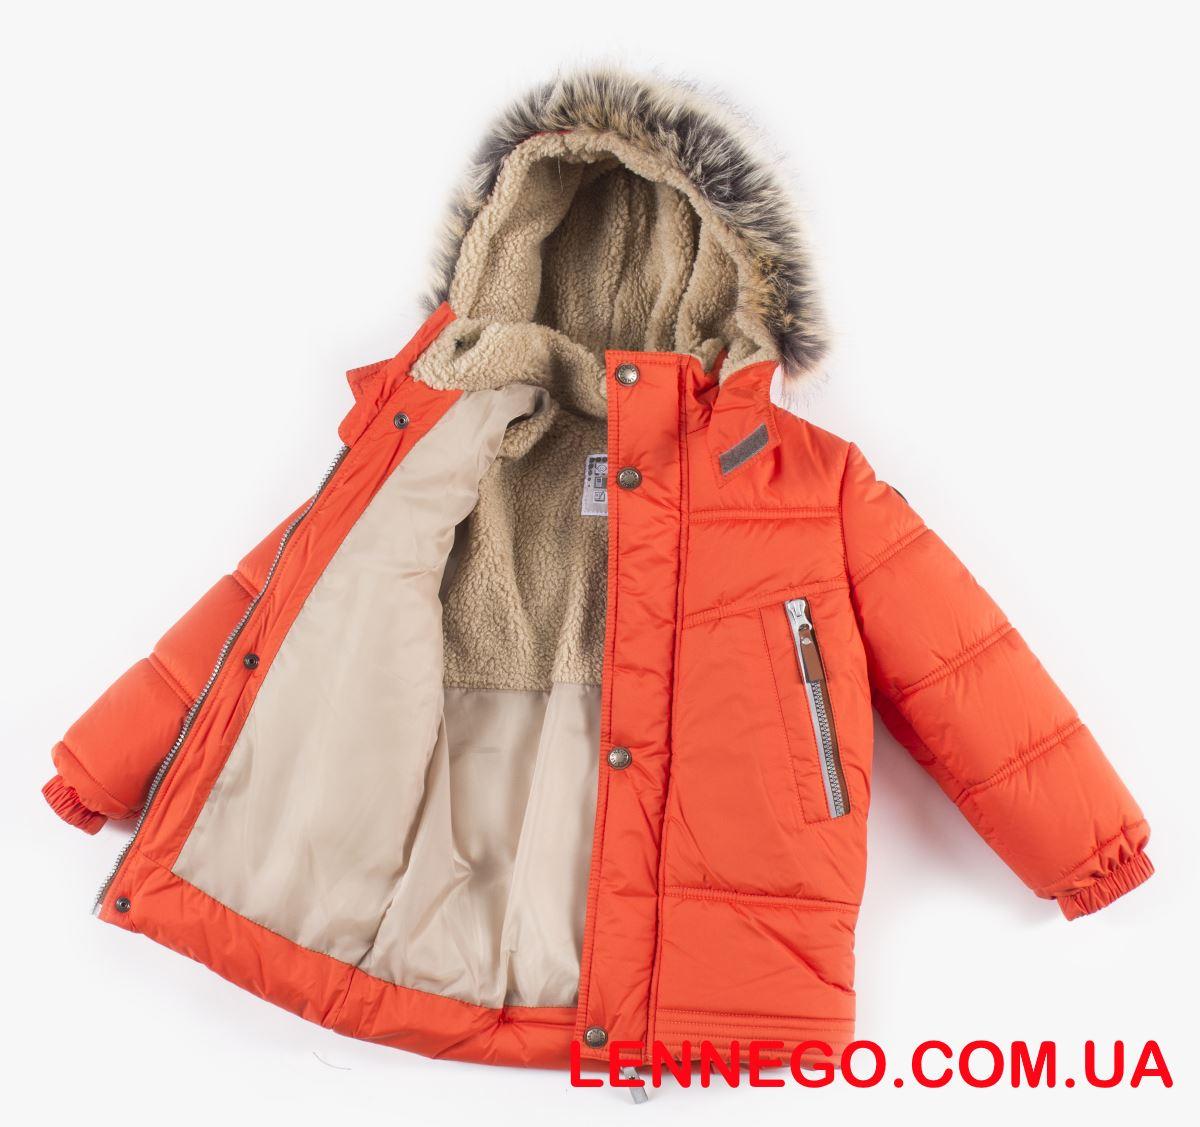 Lenne Tom зимняя куртка для мальчика оранжевая